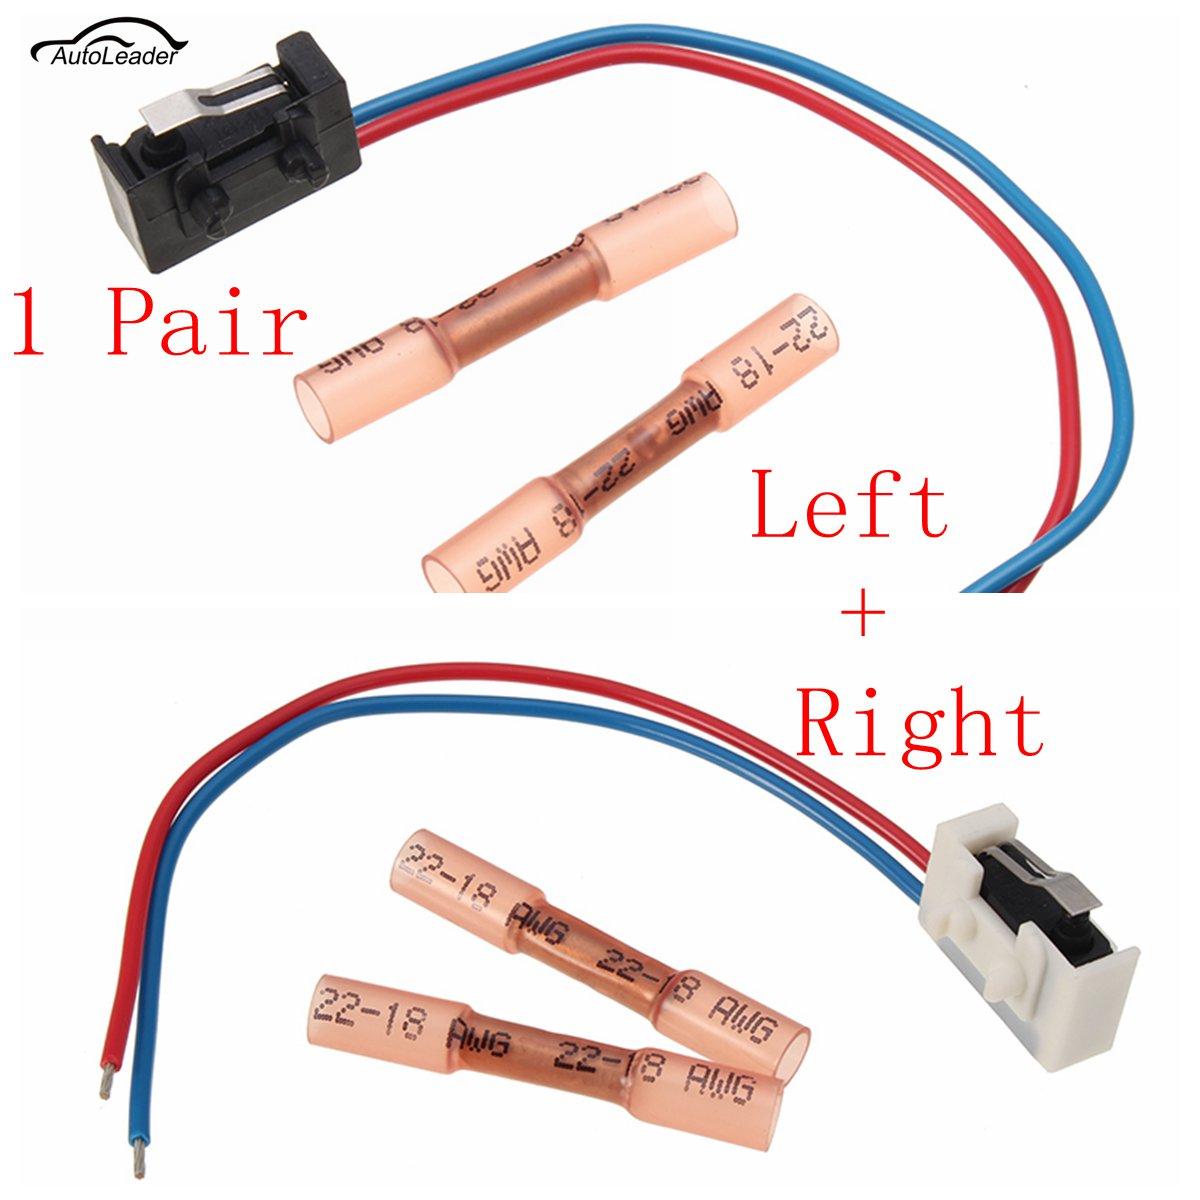 2pcs Left Right Door Lock Micro Switch For Vw Passt B5 Golf 4 Mk4 Wiring 2 Pz Sinistra Destra Serratura Della Porta Interruttore Per